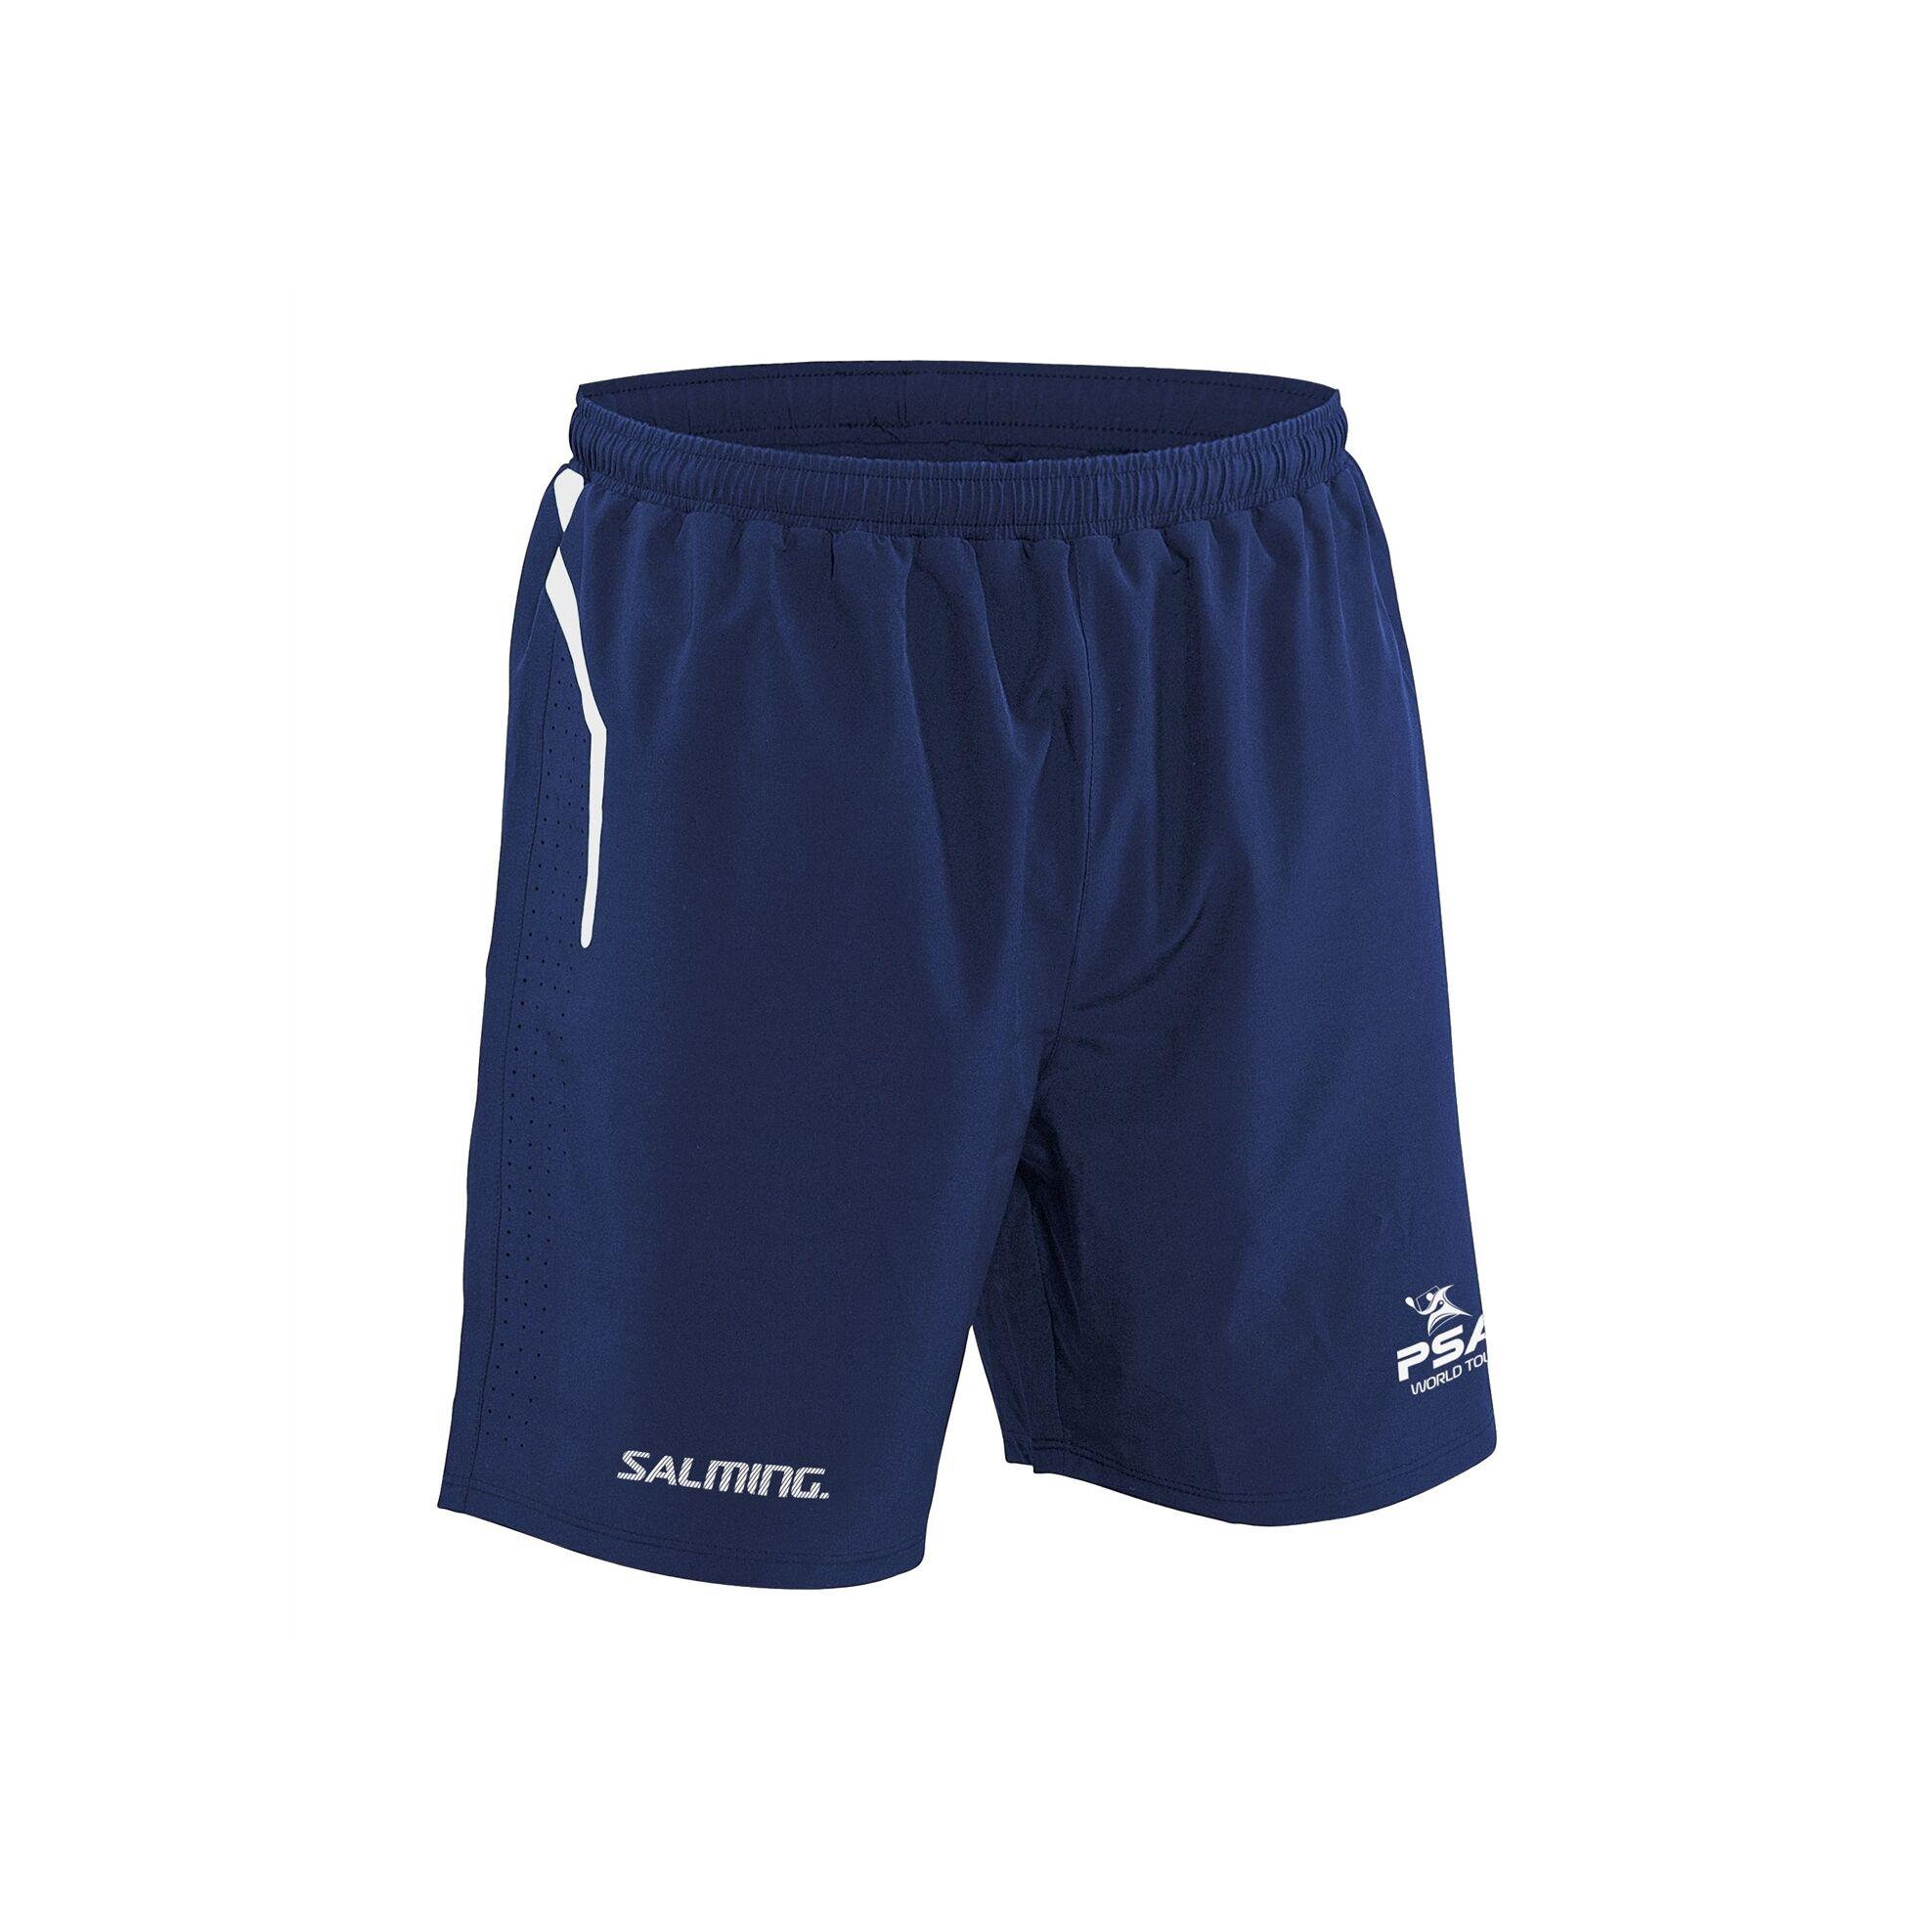 Salming PSA ProTraining Shorts Navy Blue L